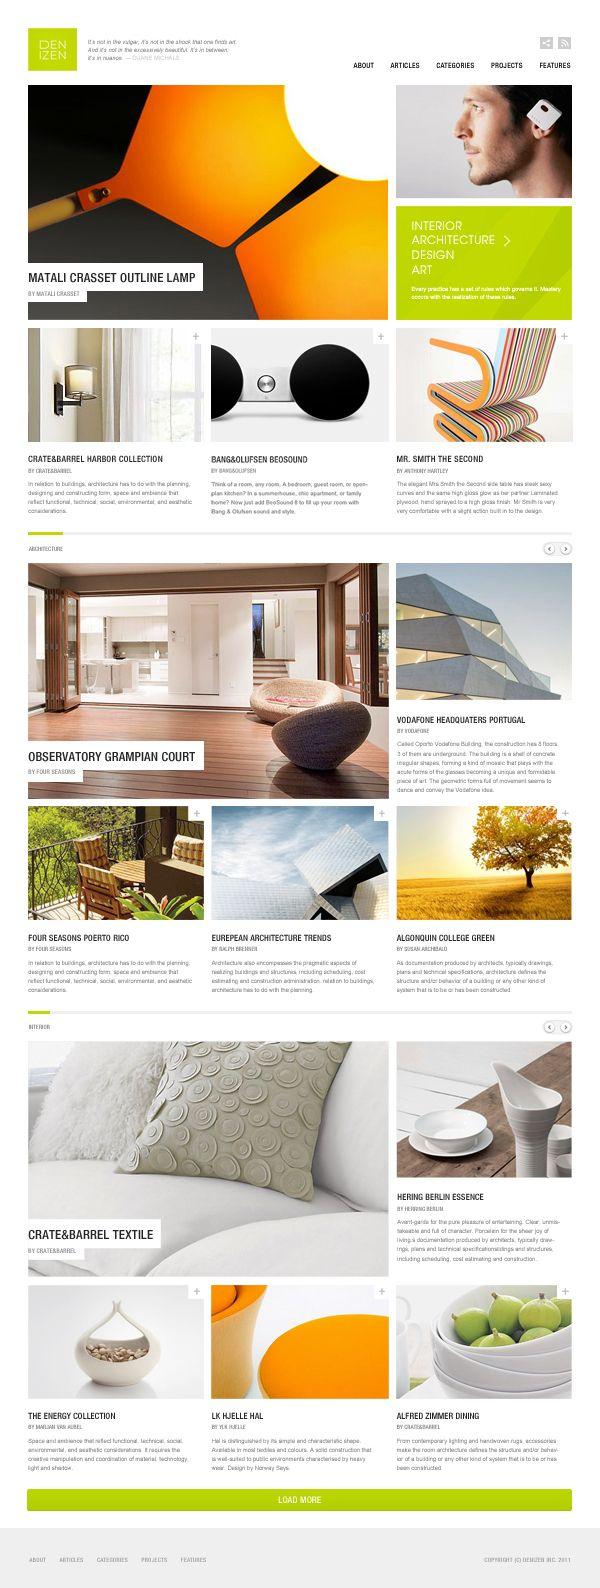 Web design dubai  Renascent New Media is a dubai based web design company specializing in architectural and interior design, website design and logo designing services.  http://www.rena-scent.com/web-design-dubai-services/